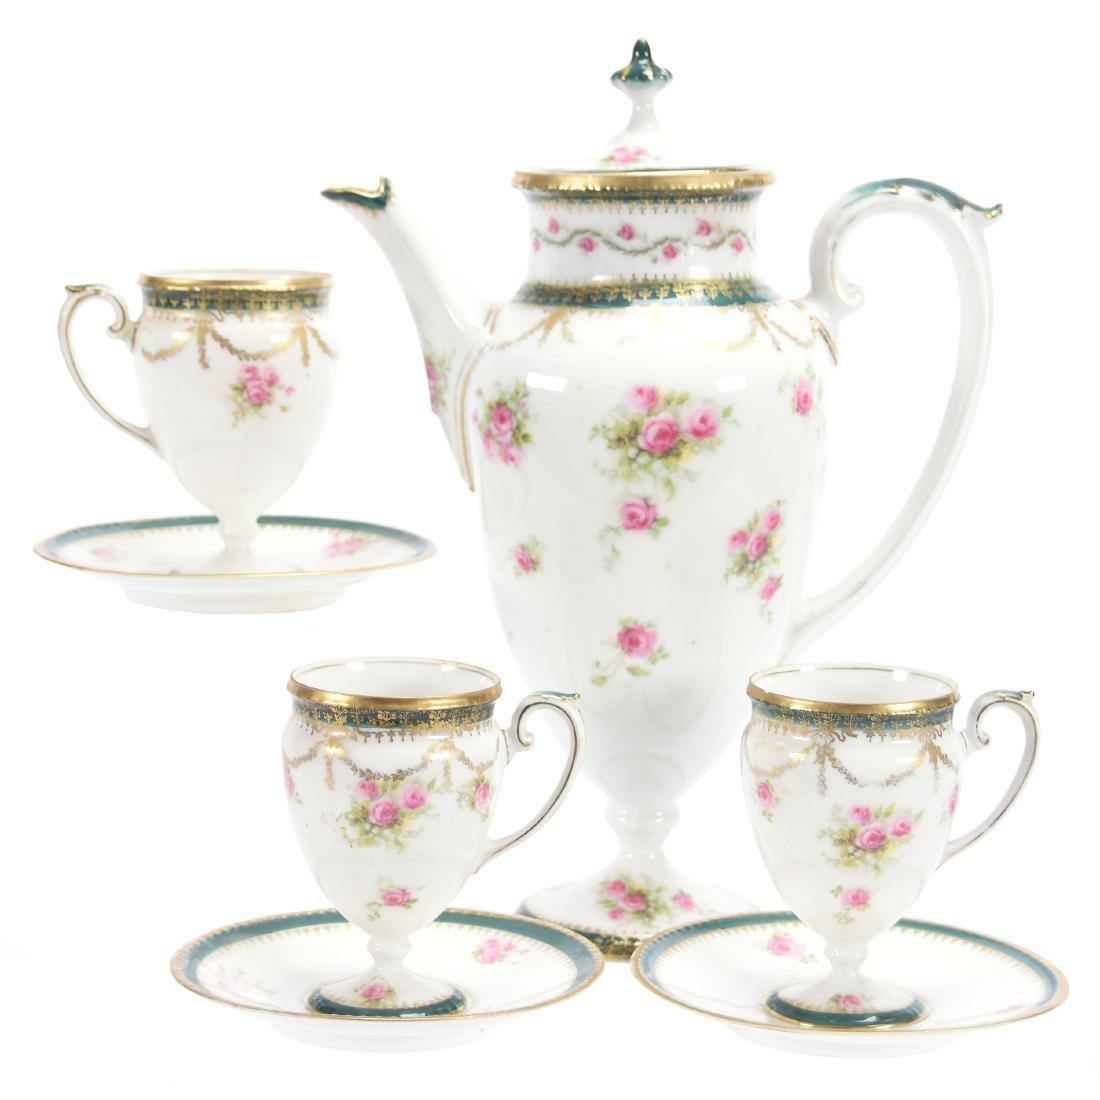 Pedestal Coffee Set, Marked R.S. Prussia